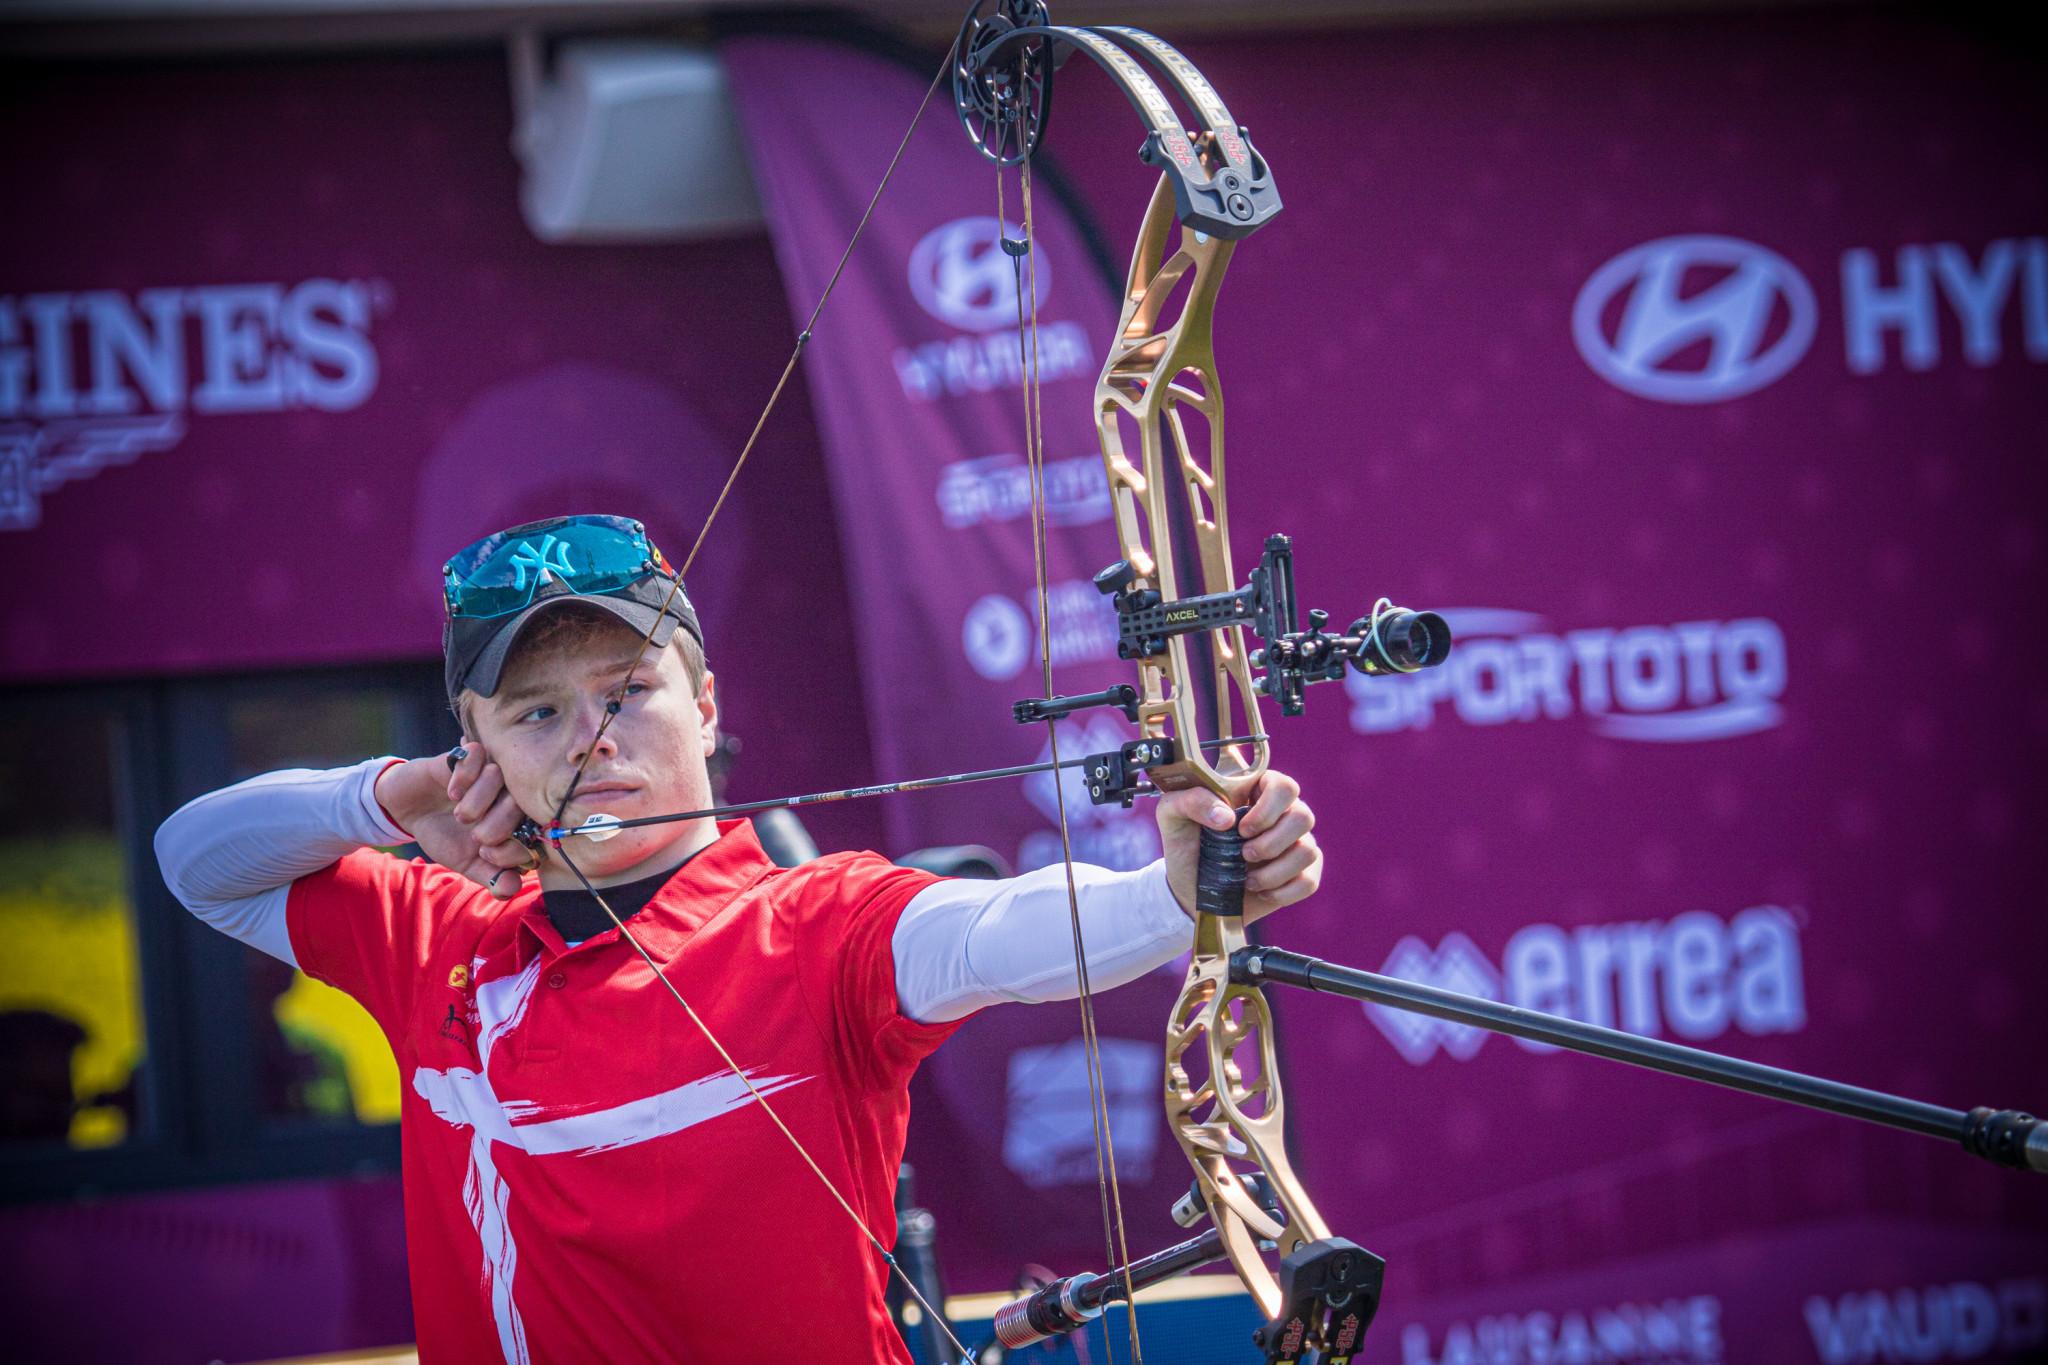 Danish archers make compound finals at European Archery Championships